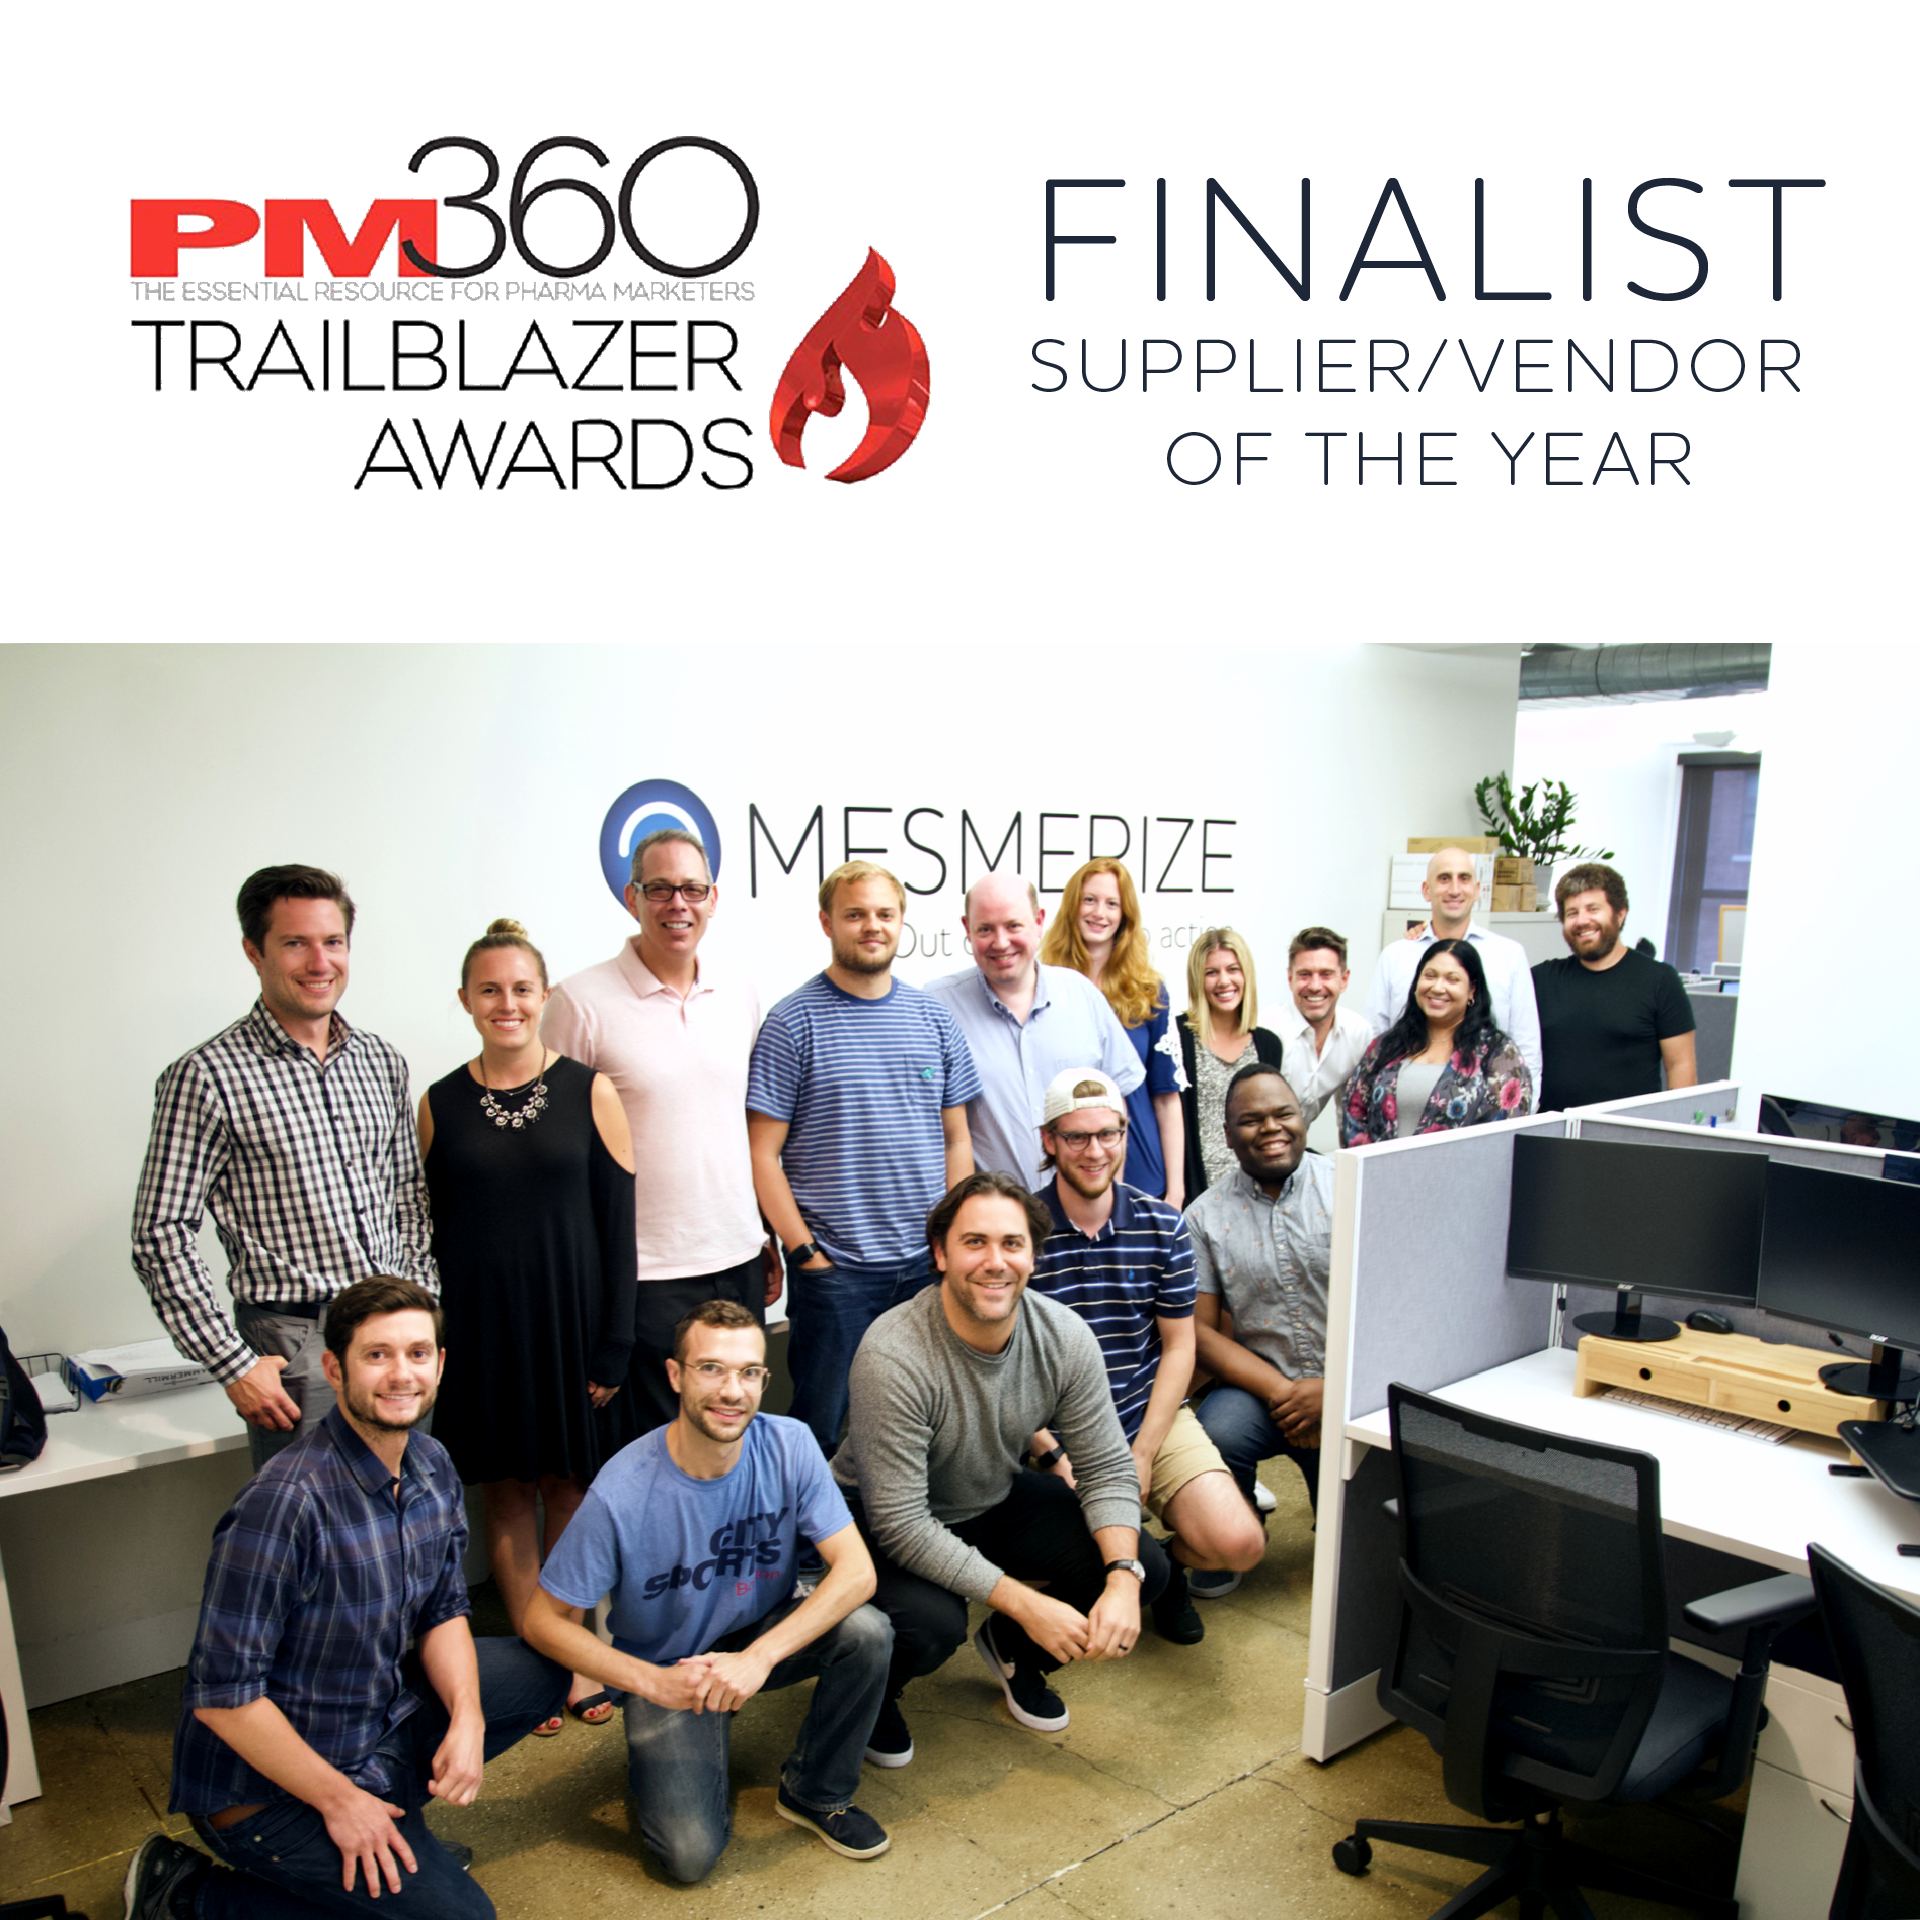 "Mesmerize Chosen as a Finalist for the 2019 Trailblazer Awards ""Supplier/Vendor of the Year"""